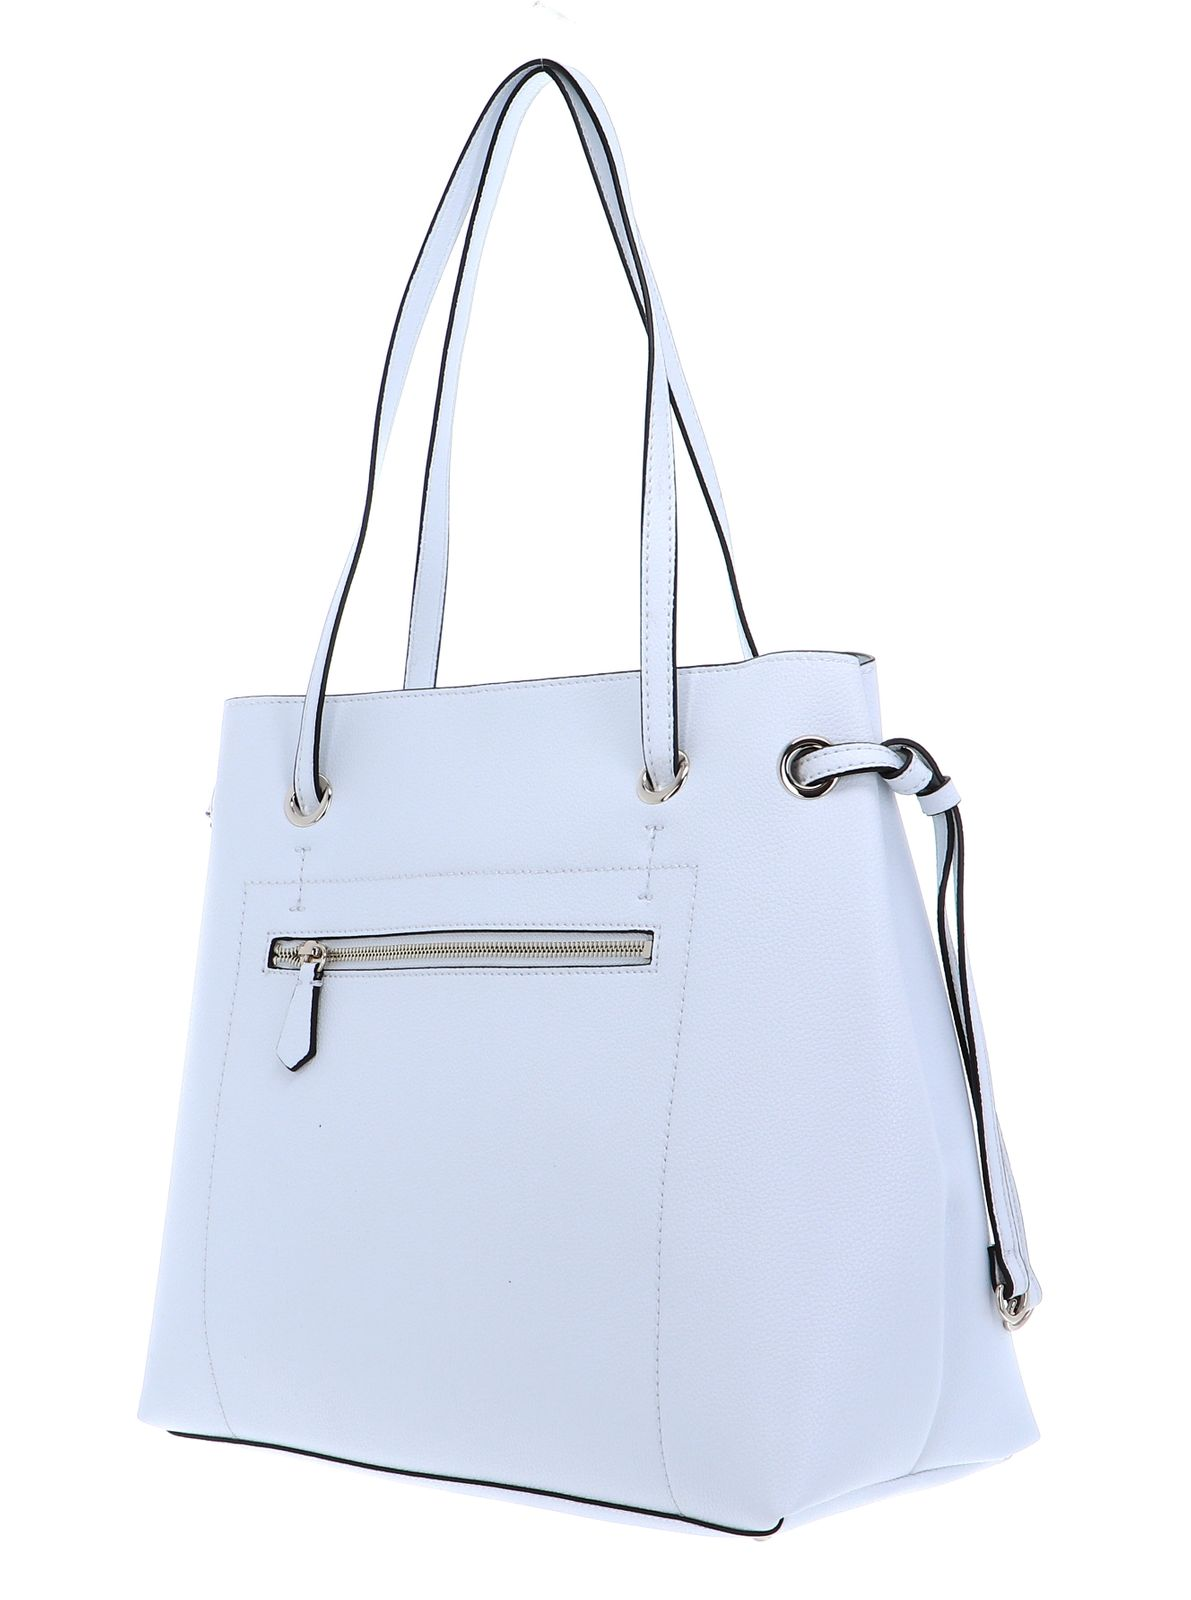 GUESS Digital Shopper White